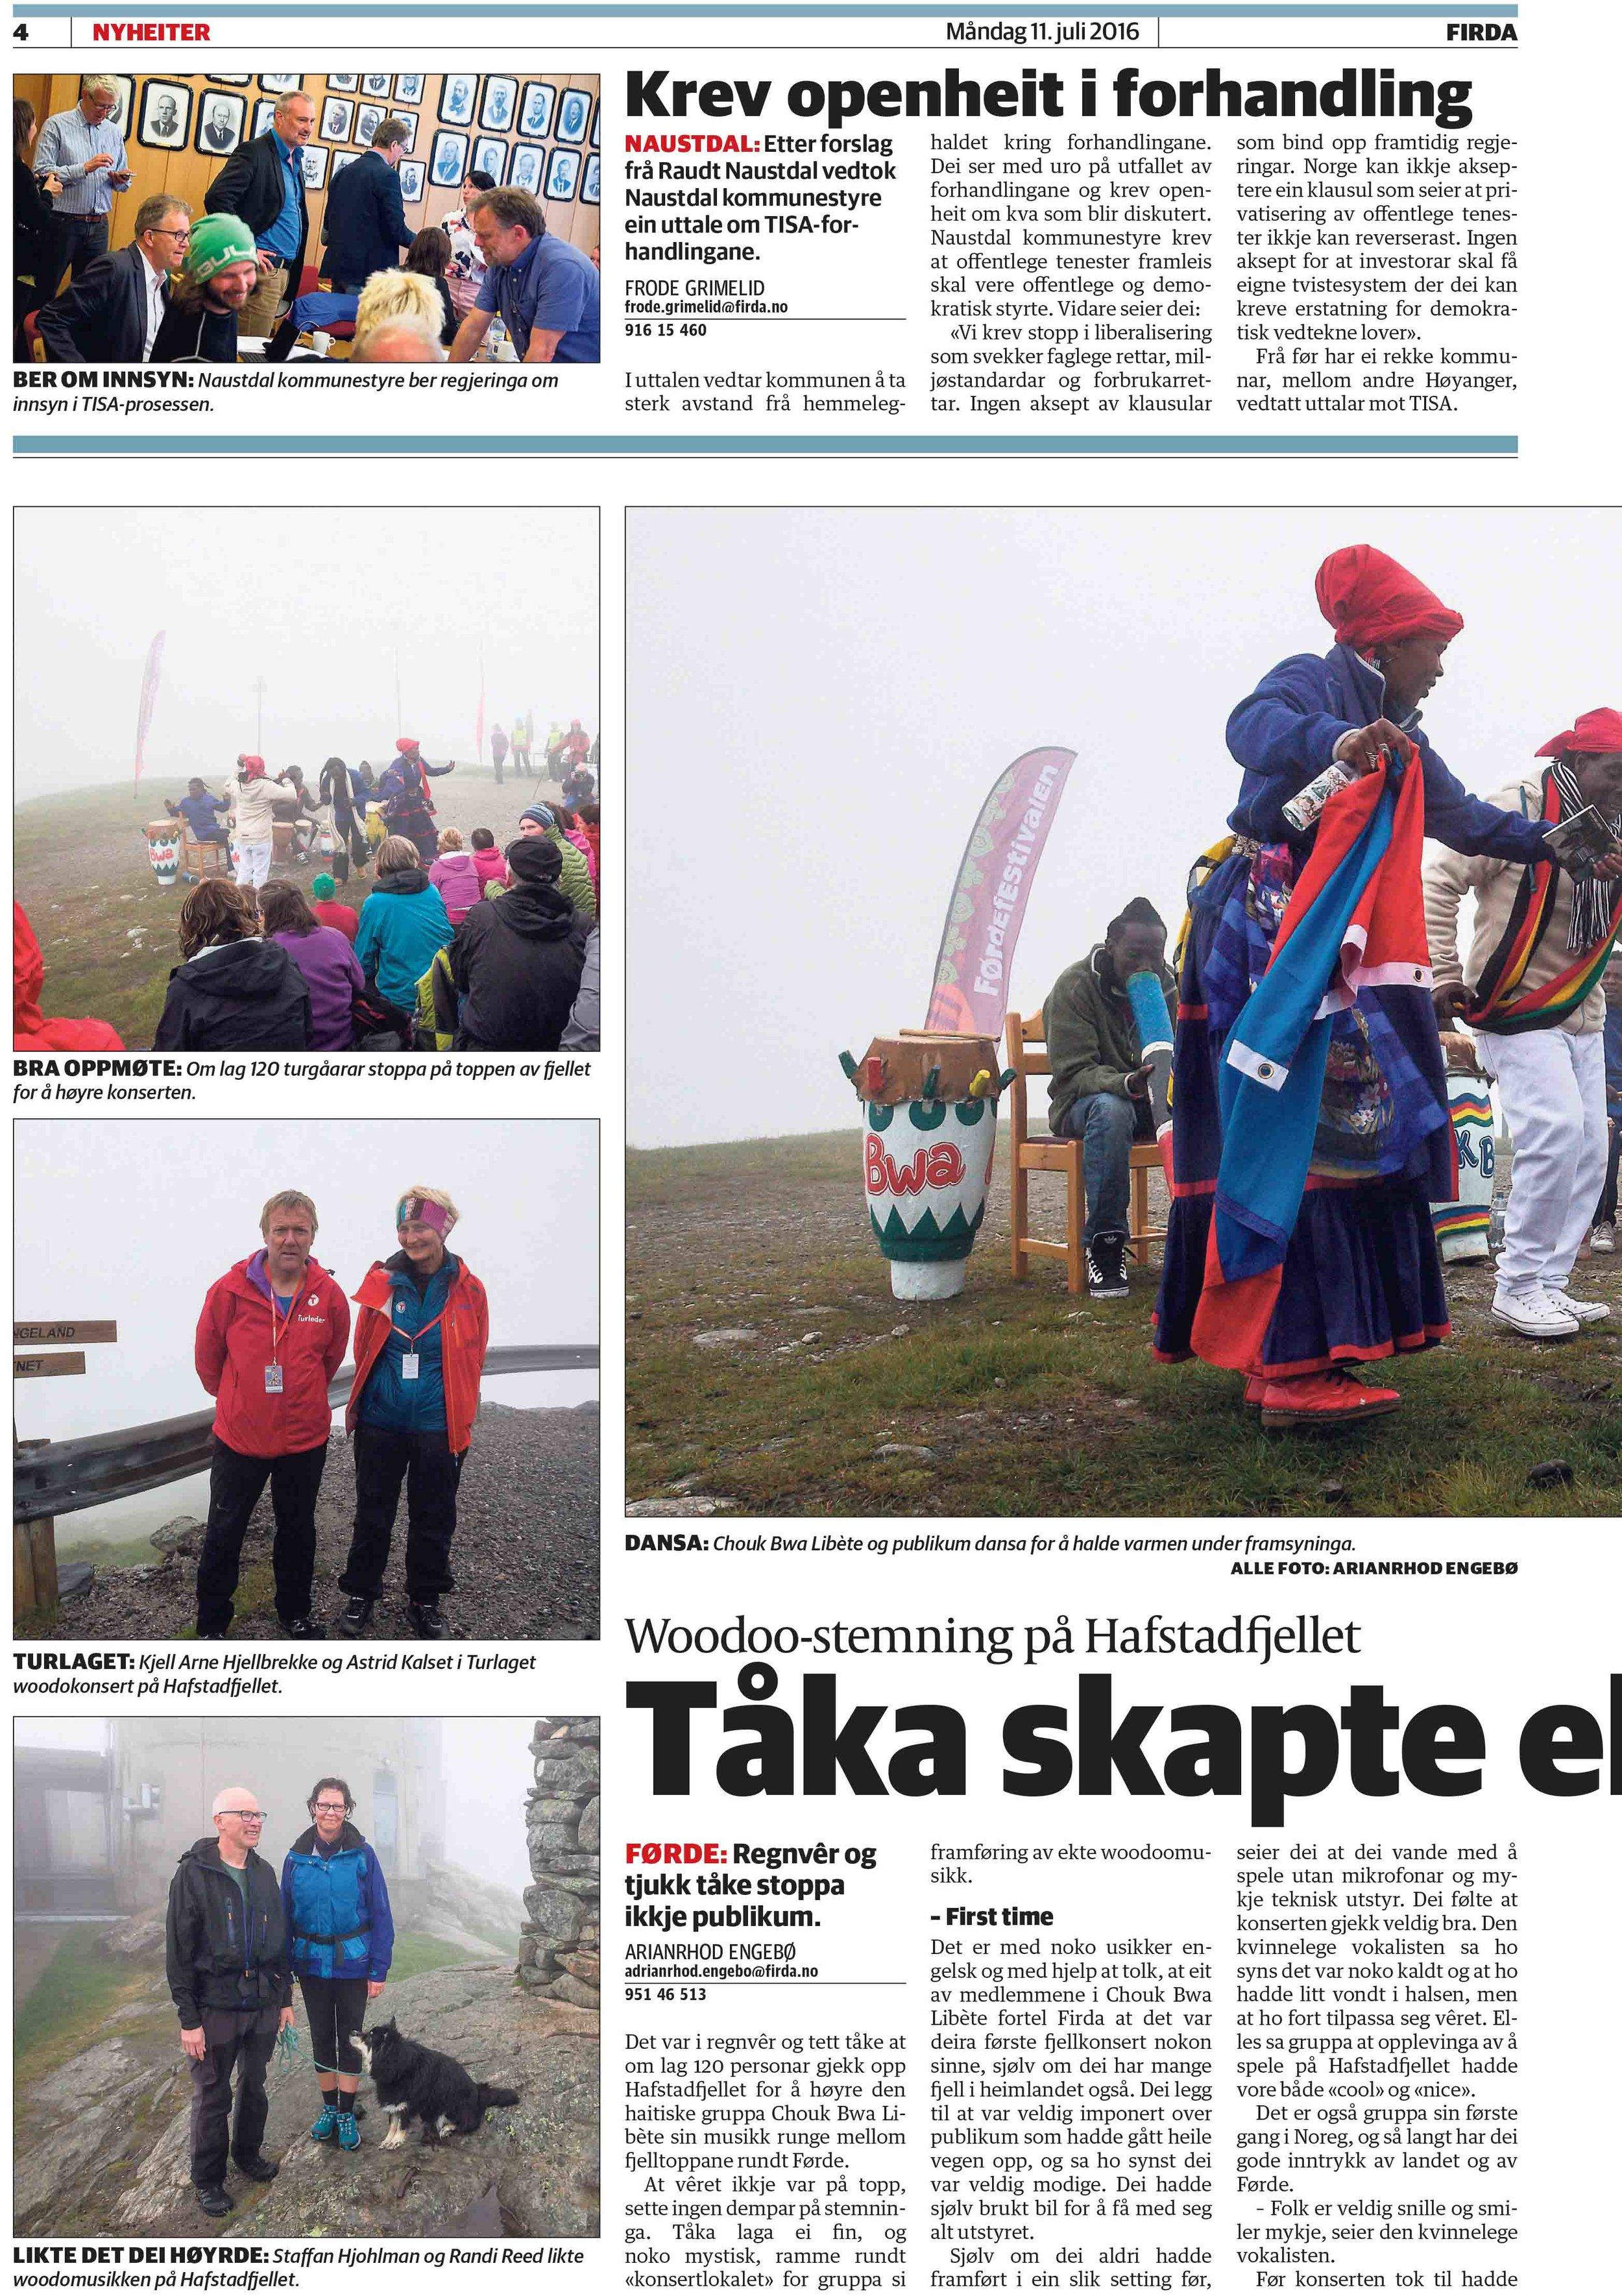 2016-07-11_Firda_-Chouk Bwa Libete på Hafstadfjellet - skapte mystikk-1.jpg